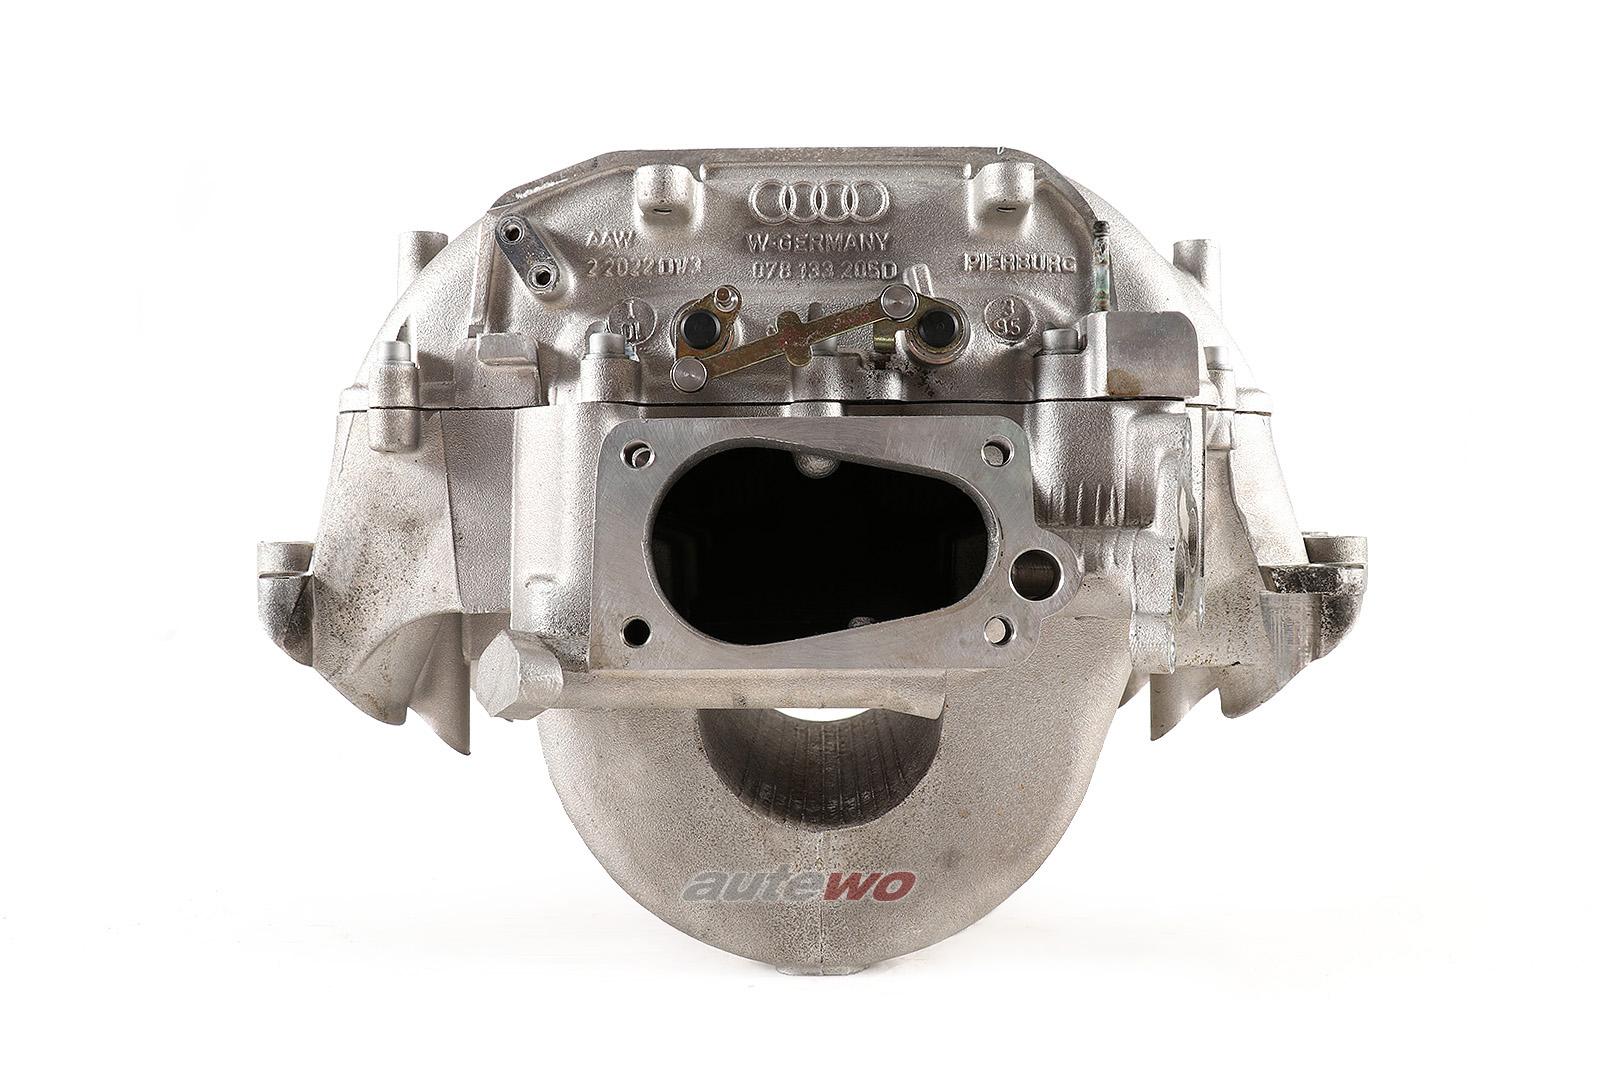 078133205D/078133206H Audi A4 B5/A6 C4/Cabrio Typ 89 2.8l Ansaugbrücke/Saugrohr